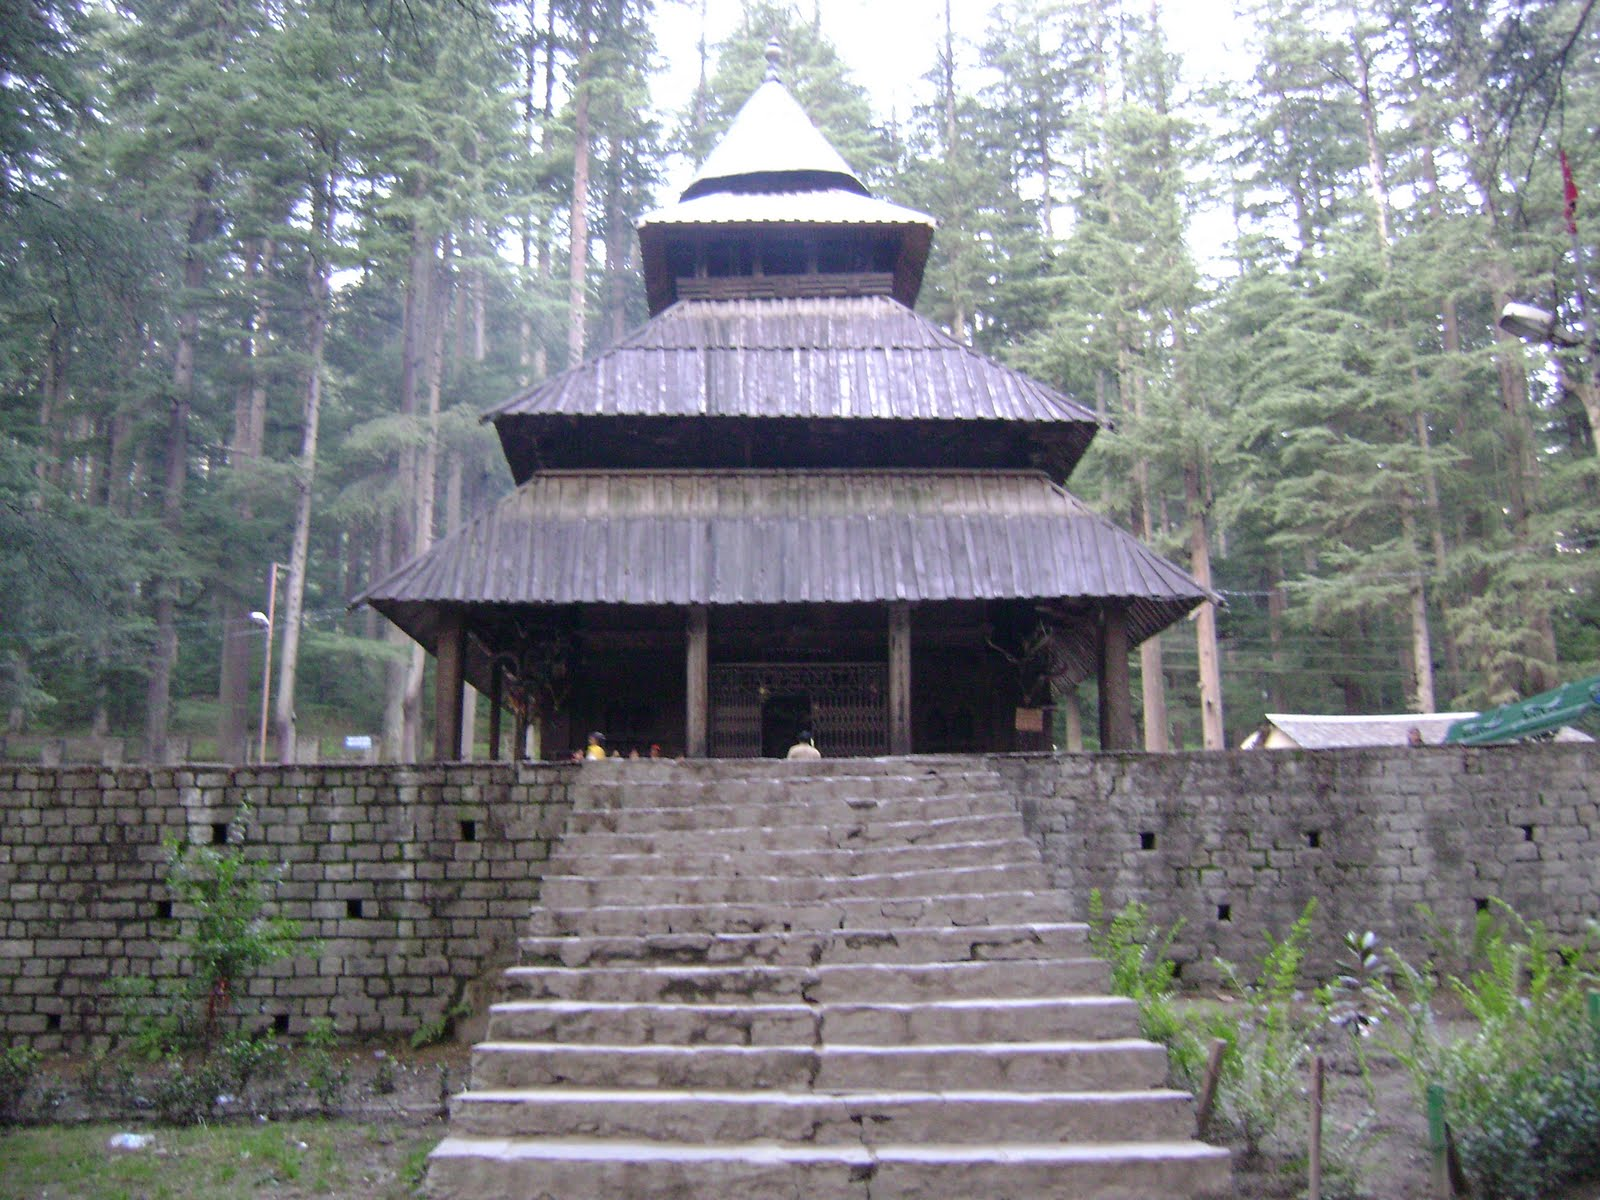 Hadimba Temple - Manali Image